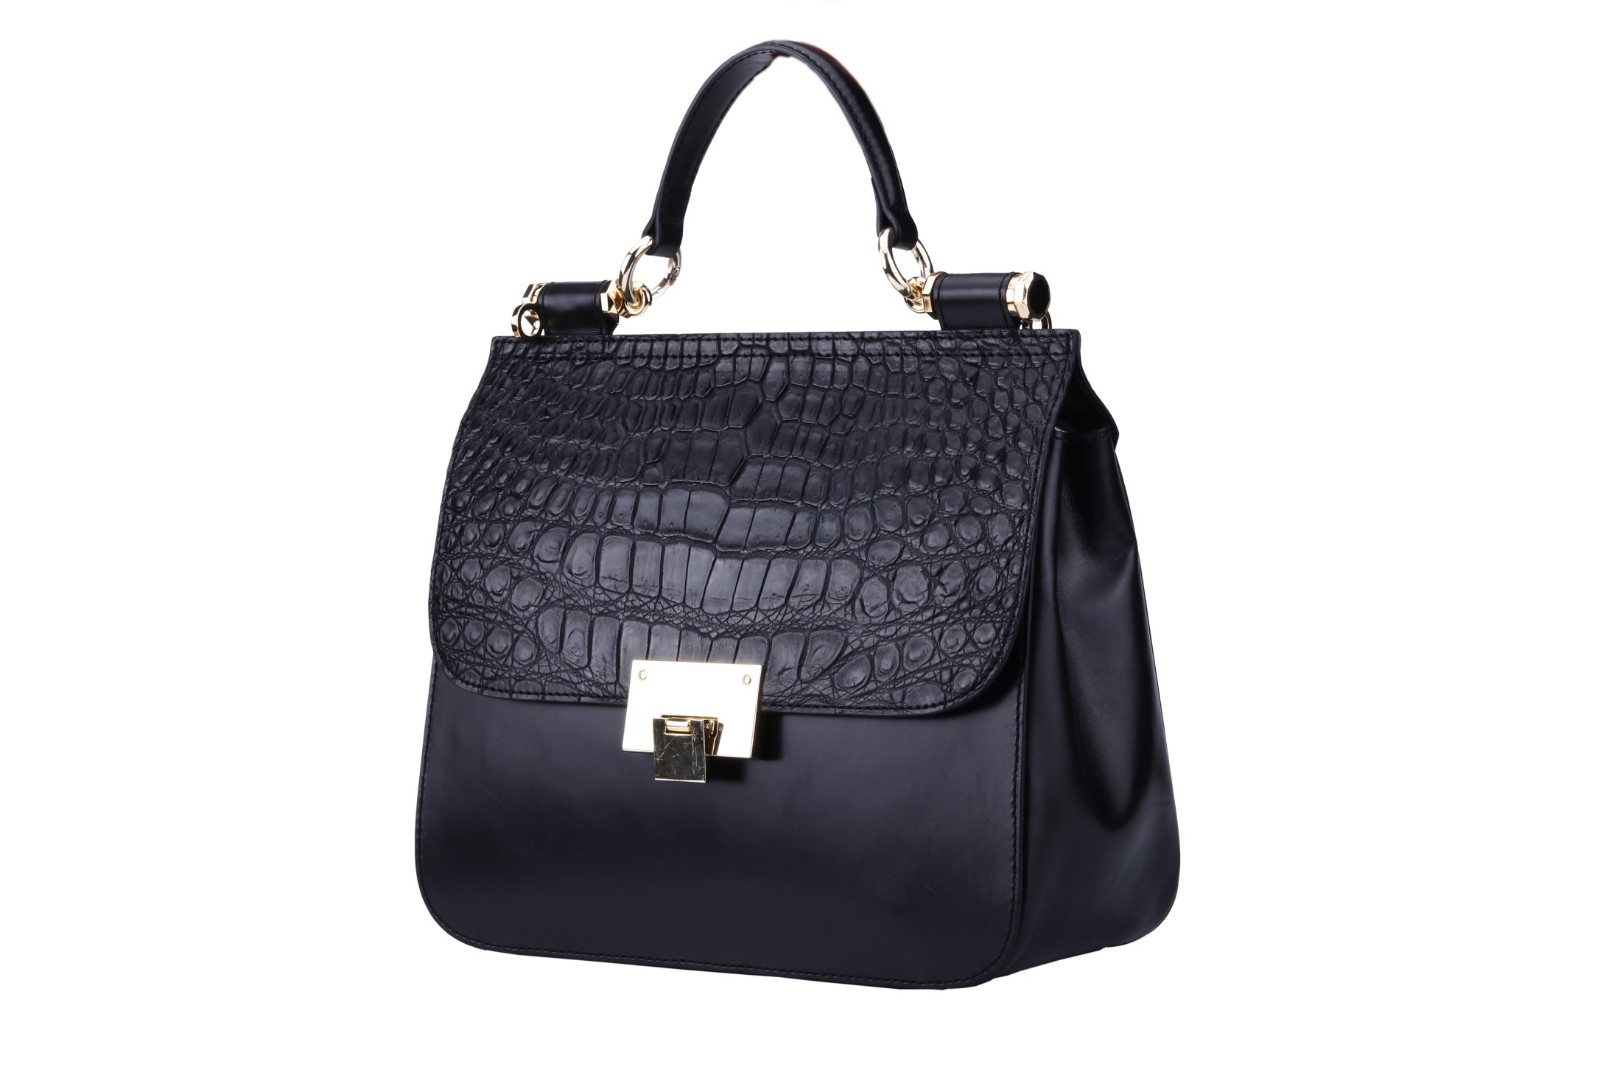 GF bags-Professional Ladies Bag Affordable Handbags From Gaofeng Bags-8